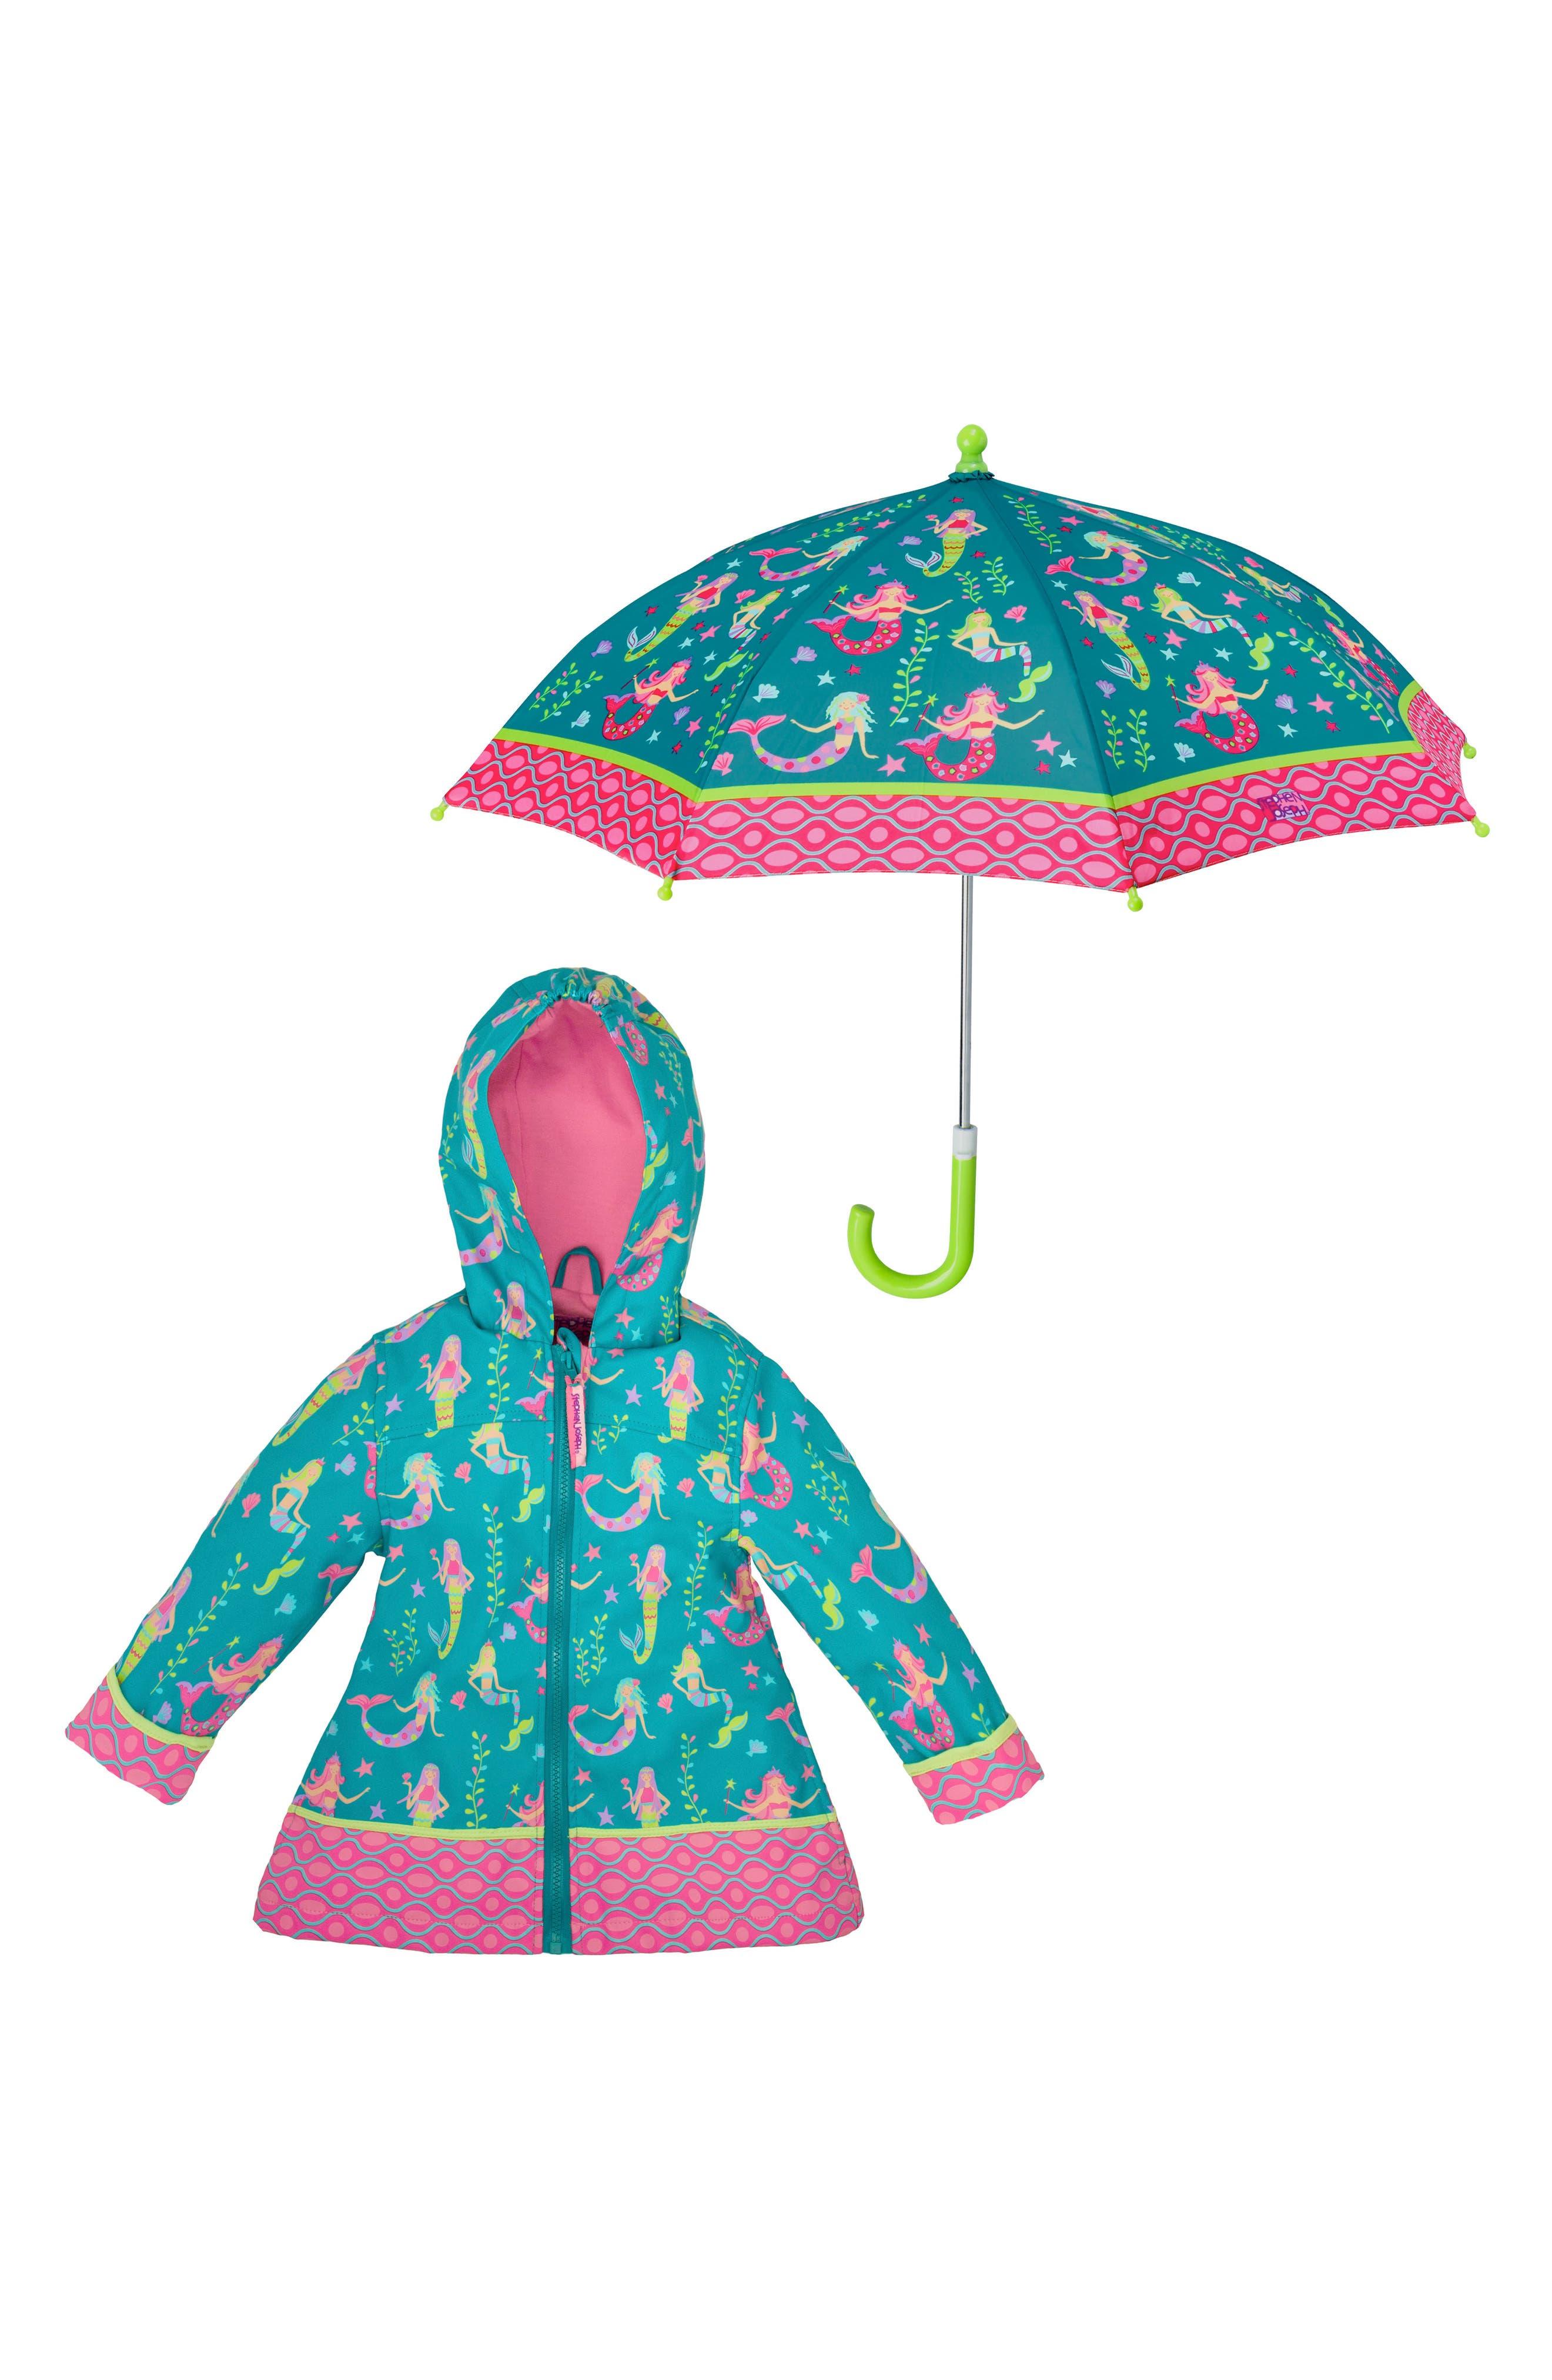 Alternate Image 1 Selected - Stephen Joseph Mermaid Raincoat & Umbrella Set (Toddler Girls, Little Girls & Big Girls)